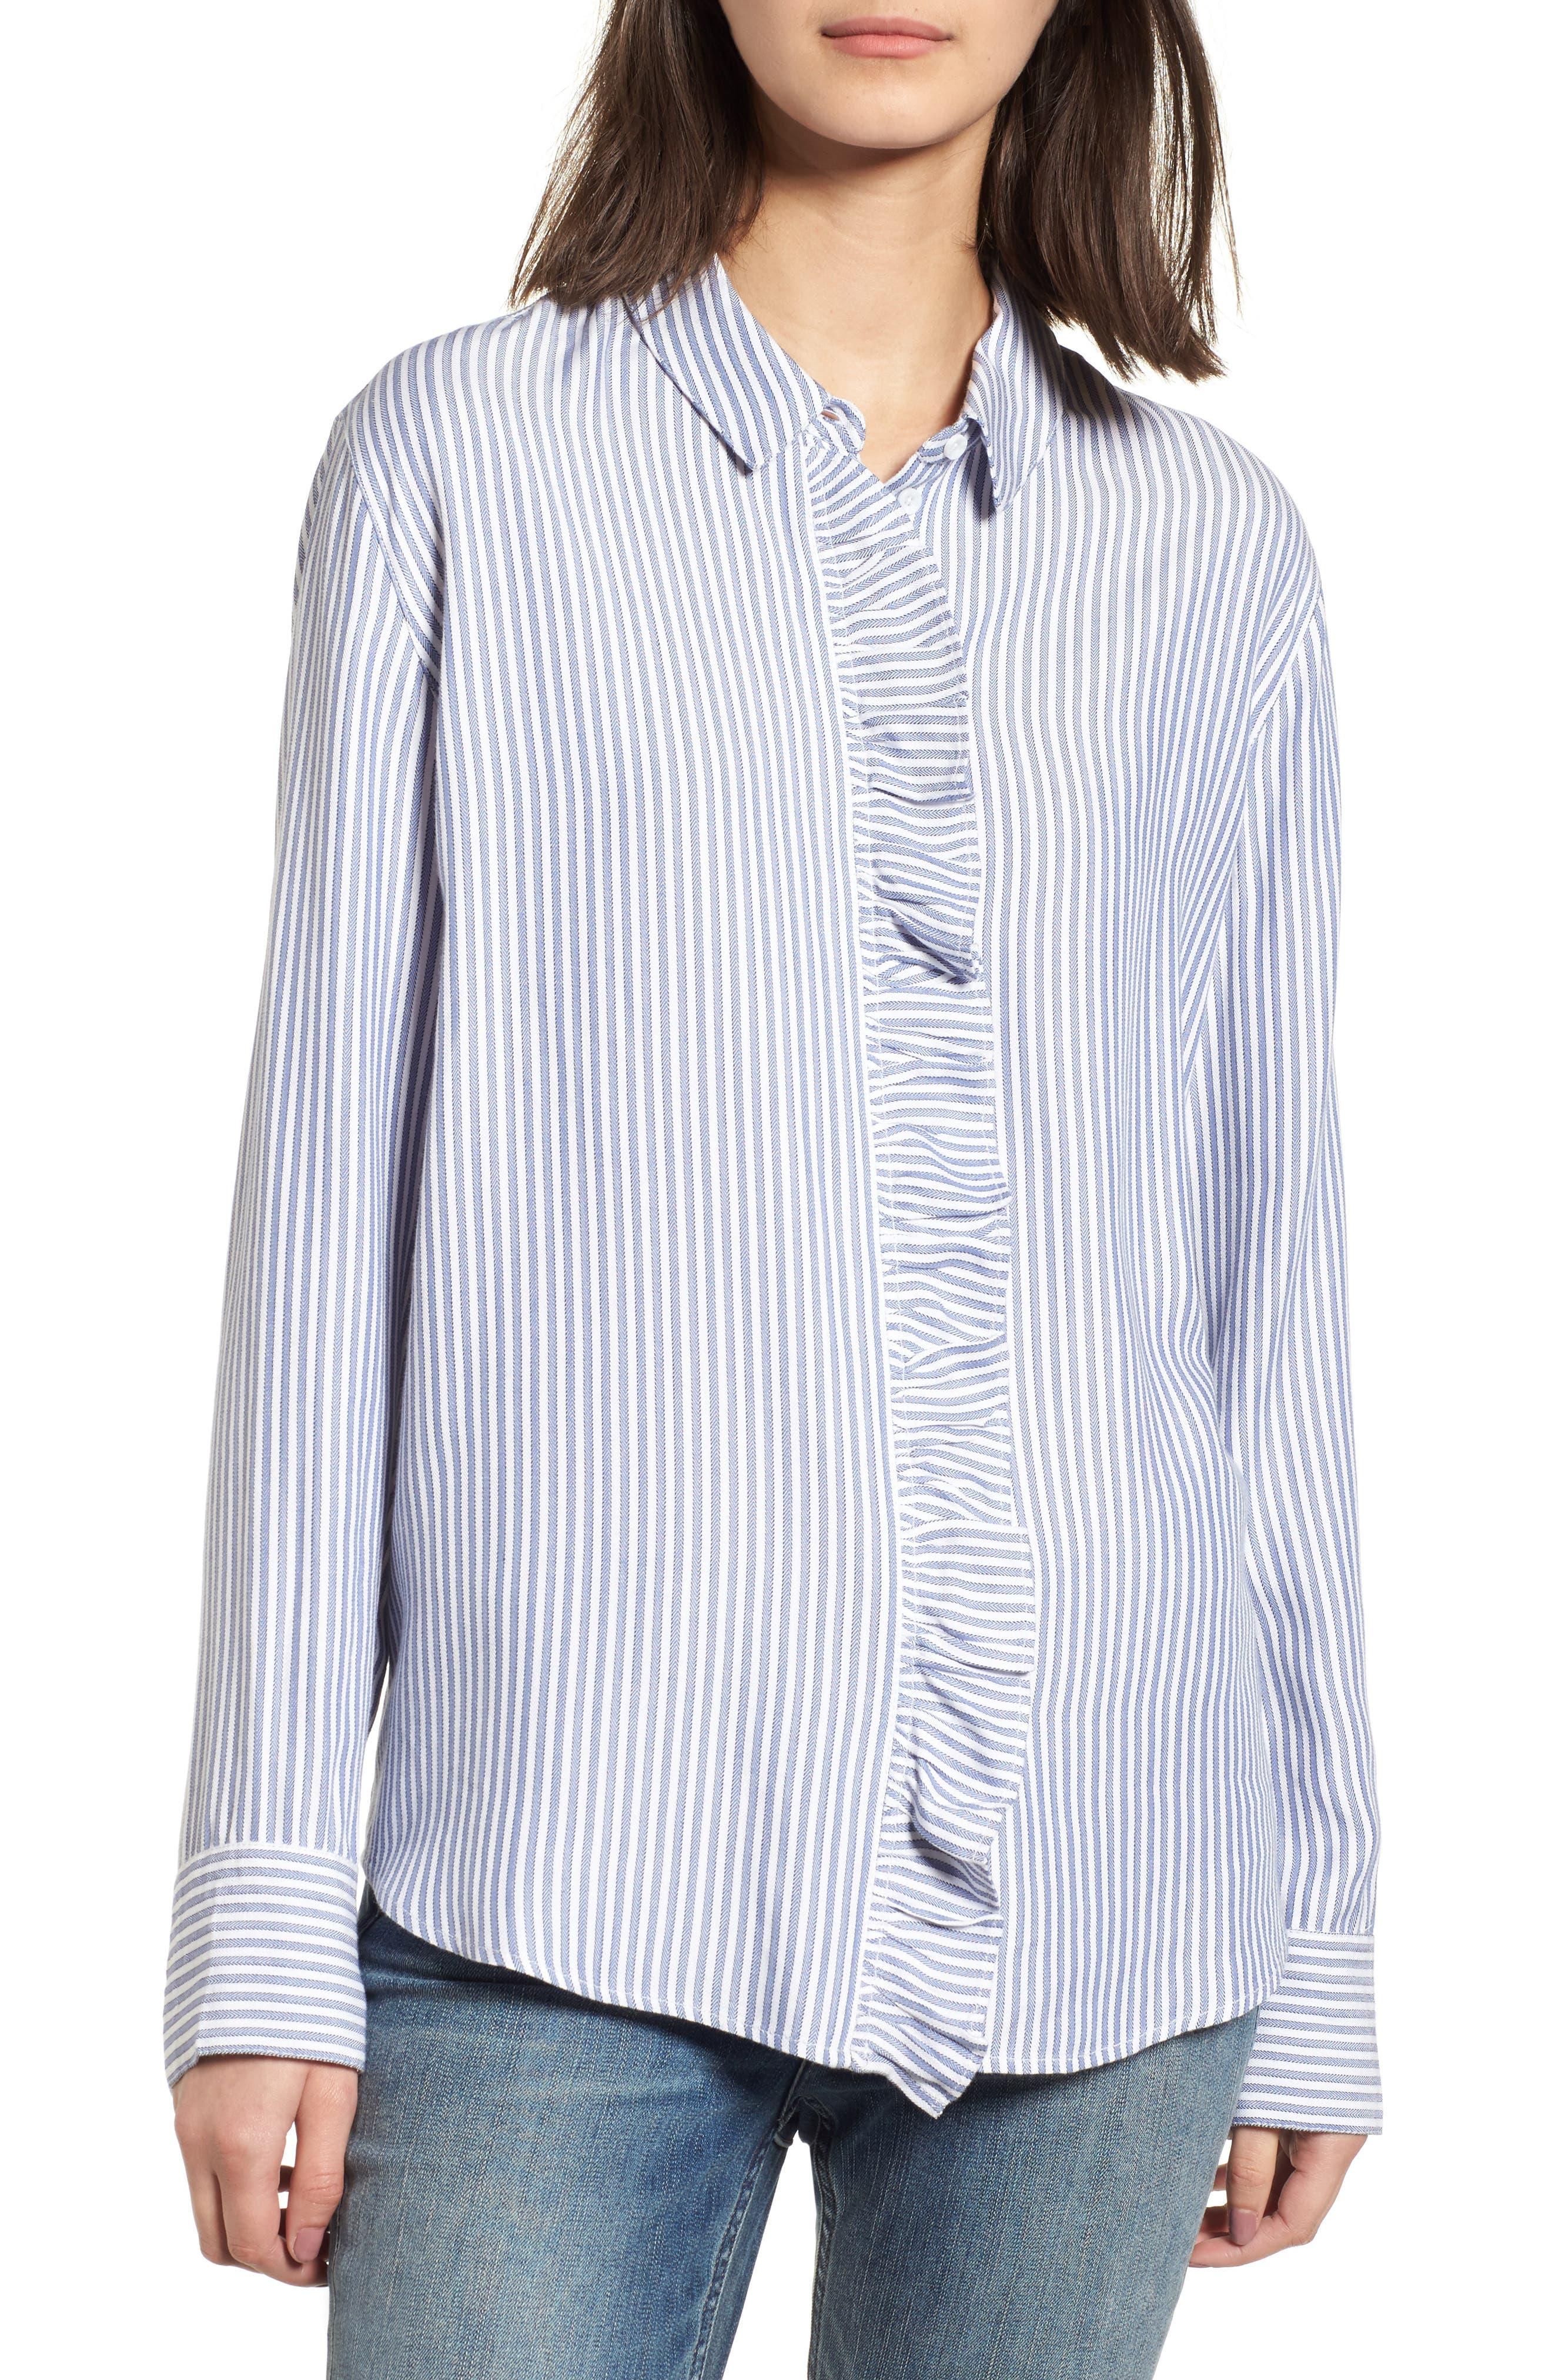 Treasure & Bond Stripe Ruffle Shirt